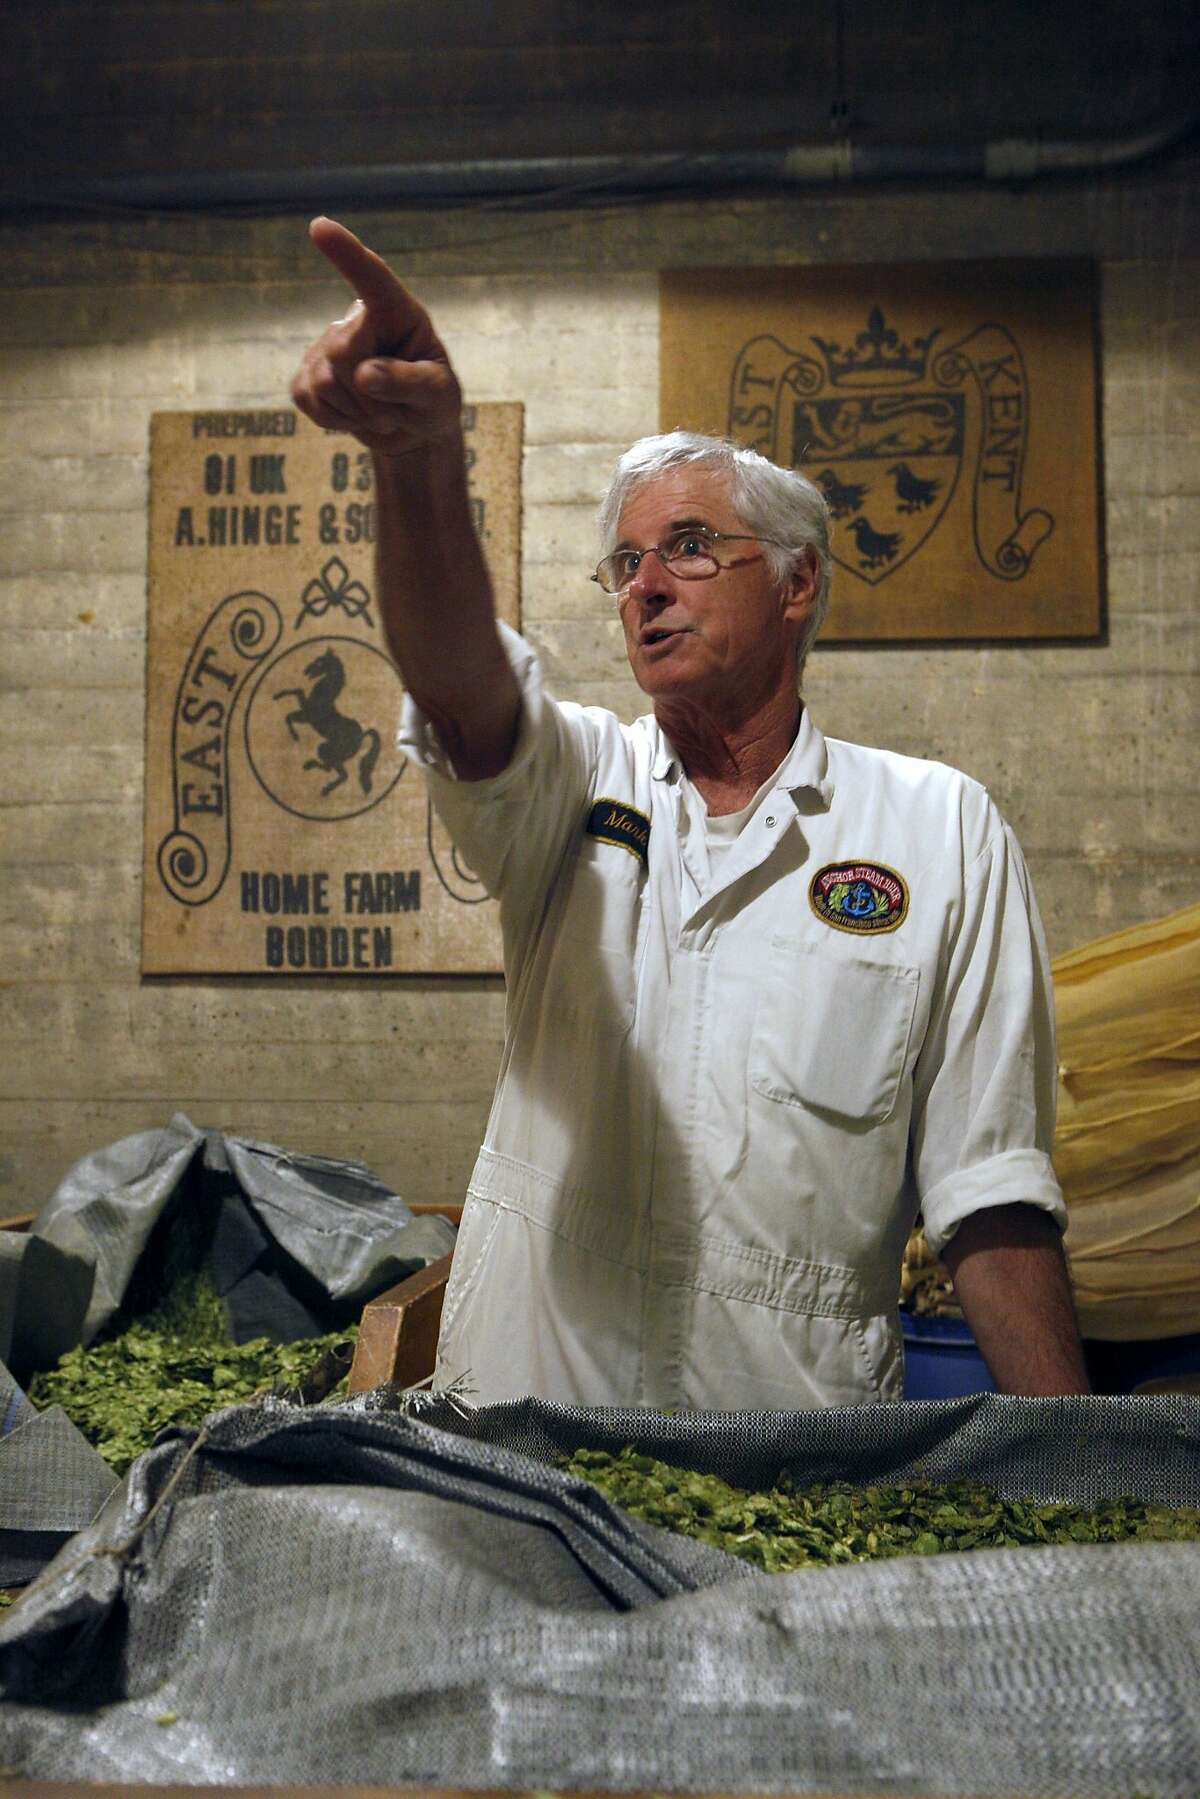 Mark checks out the hops at Anchor Brewing, Monday, April 27, 2015, in San Francisco, Calif.